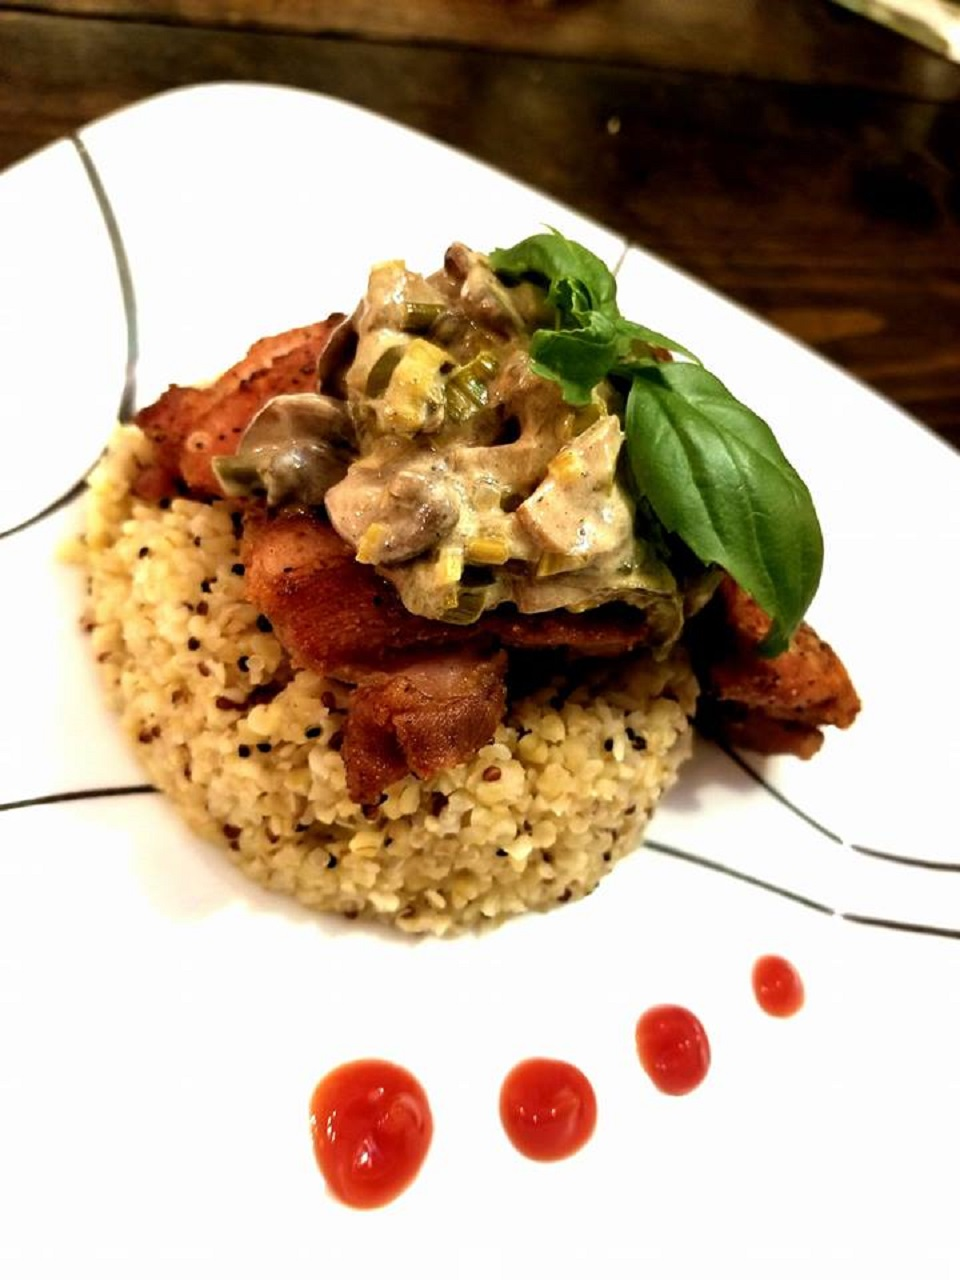 Chicken Thighs with Mushroom-Leek Sauce Deana R Okun